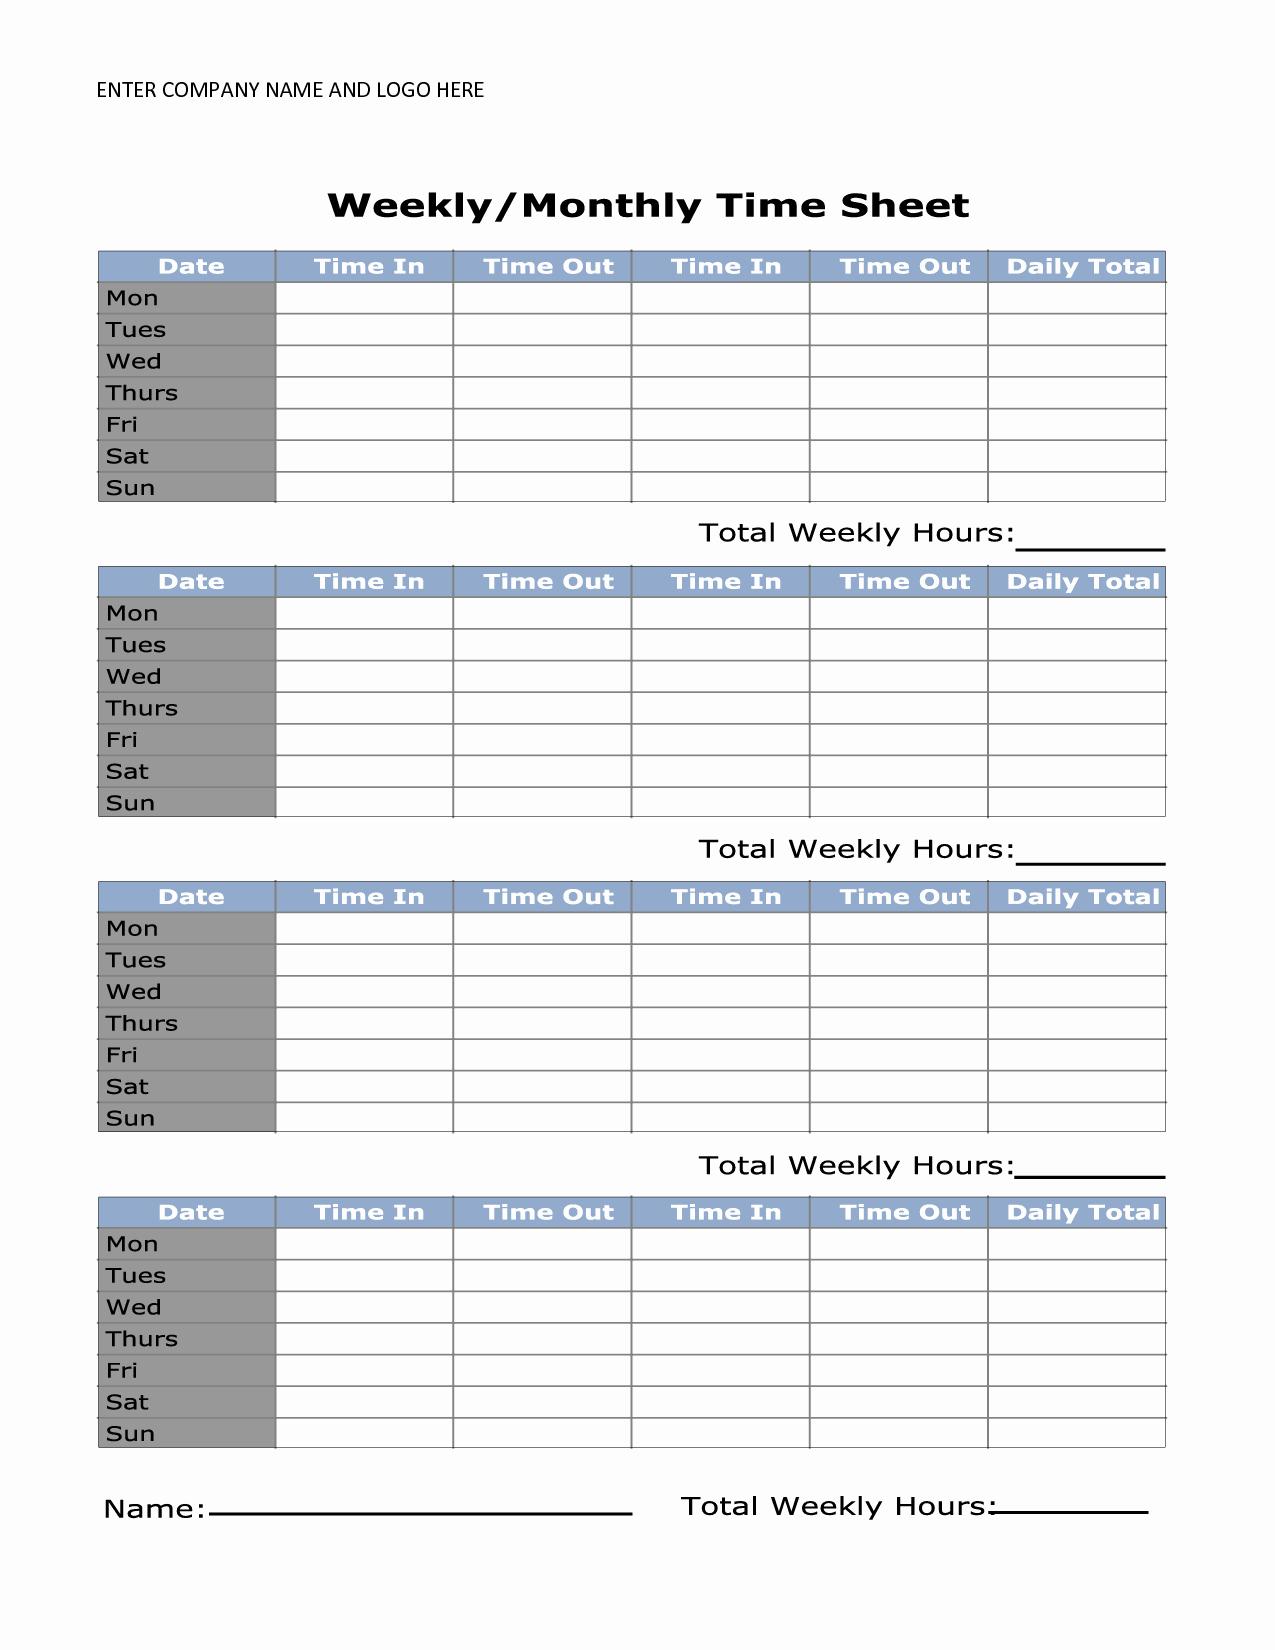 Daily Time Sheets Free Printable Unique Printable Weekly Timesheet Template Uma Printable